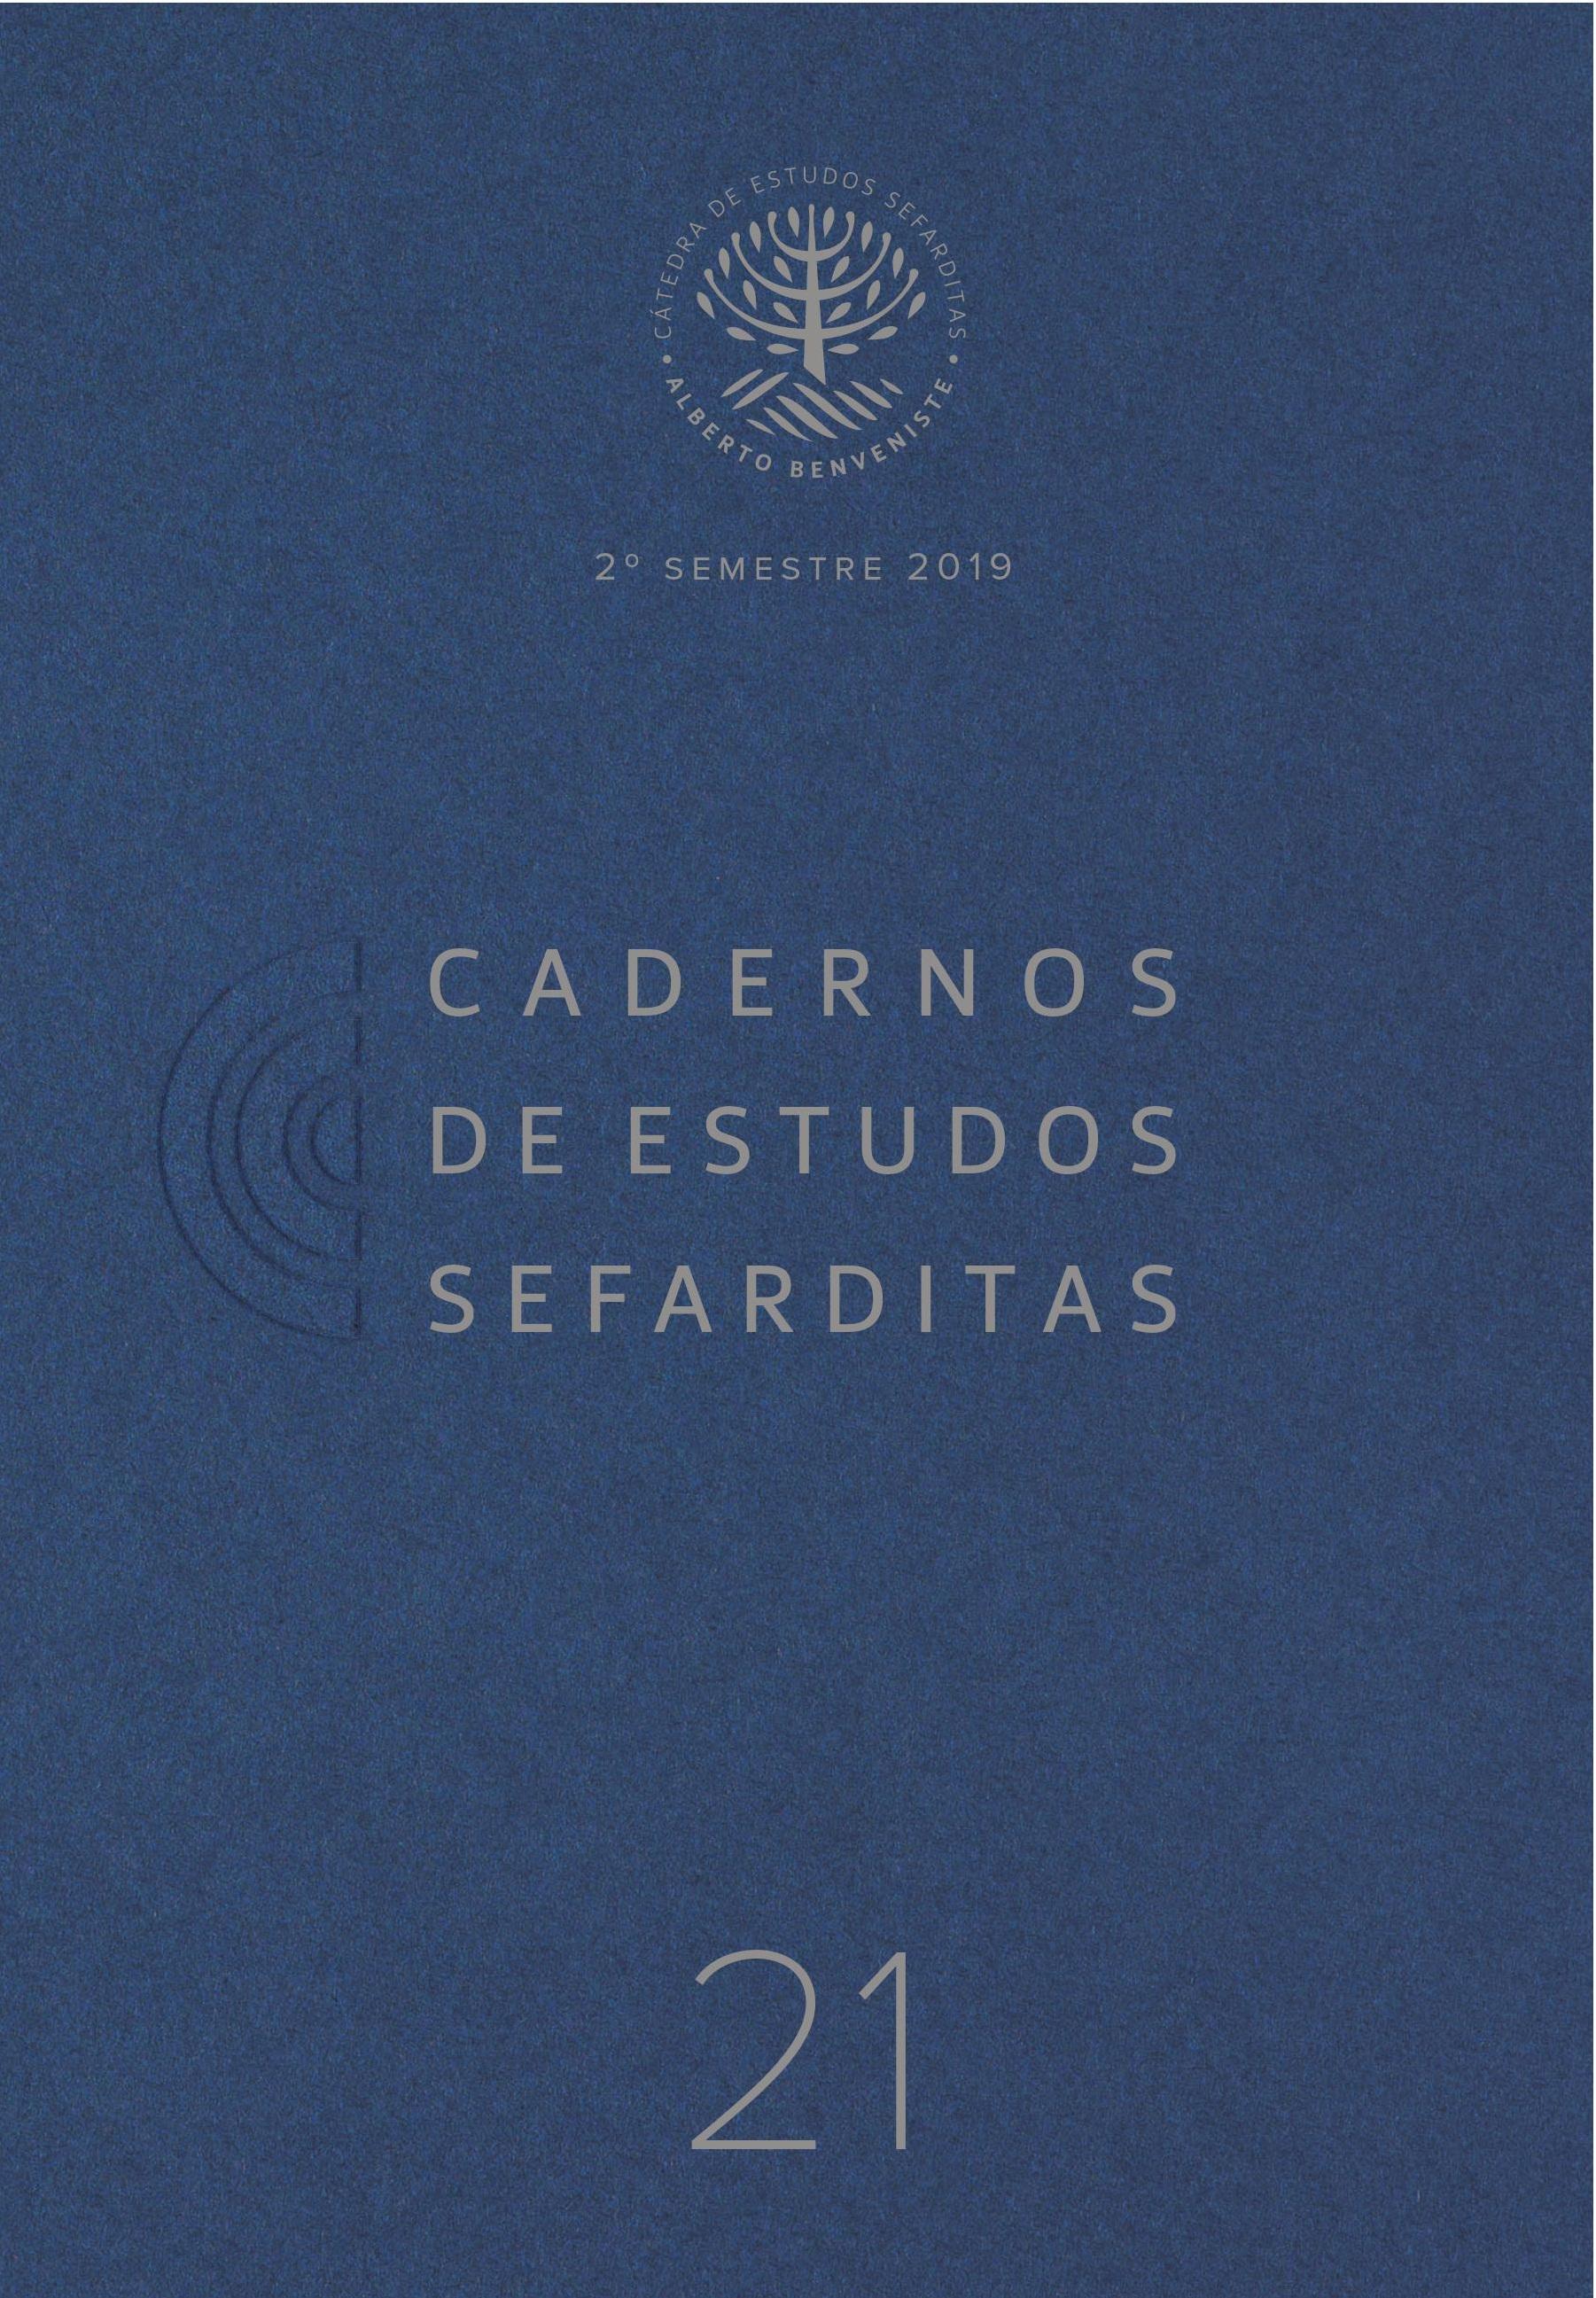 O novo número dos Cadernos de Estudos Sefarditas